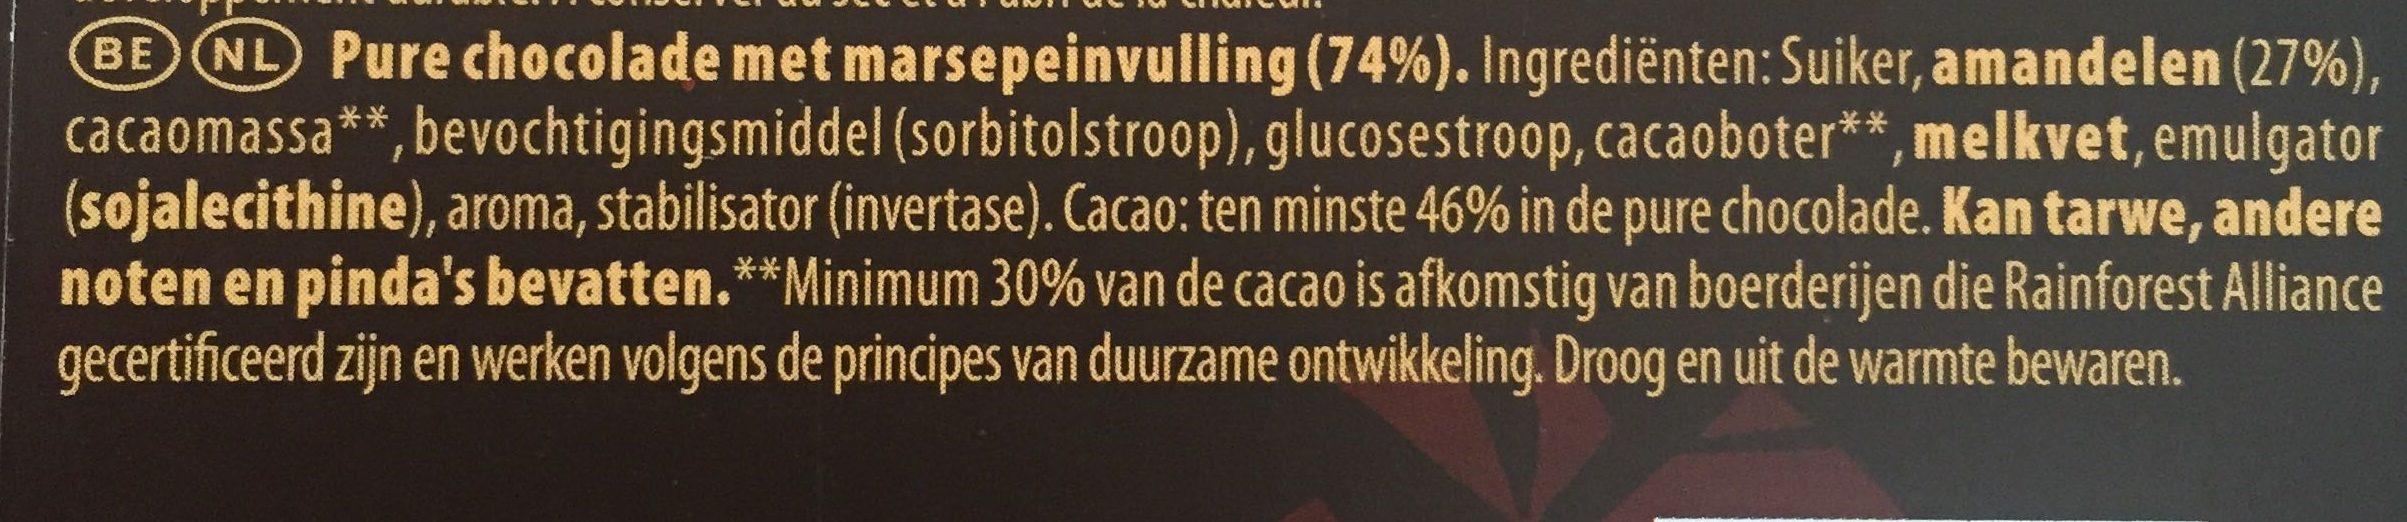 Fusion Pâte d'Amande Noir - Ingrediënten - nl